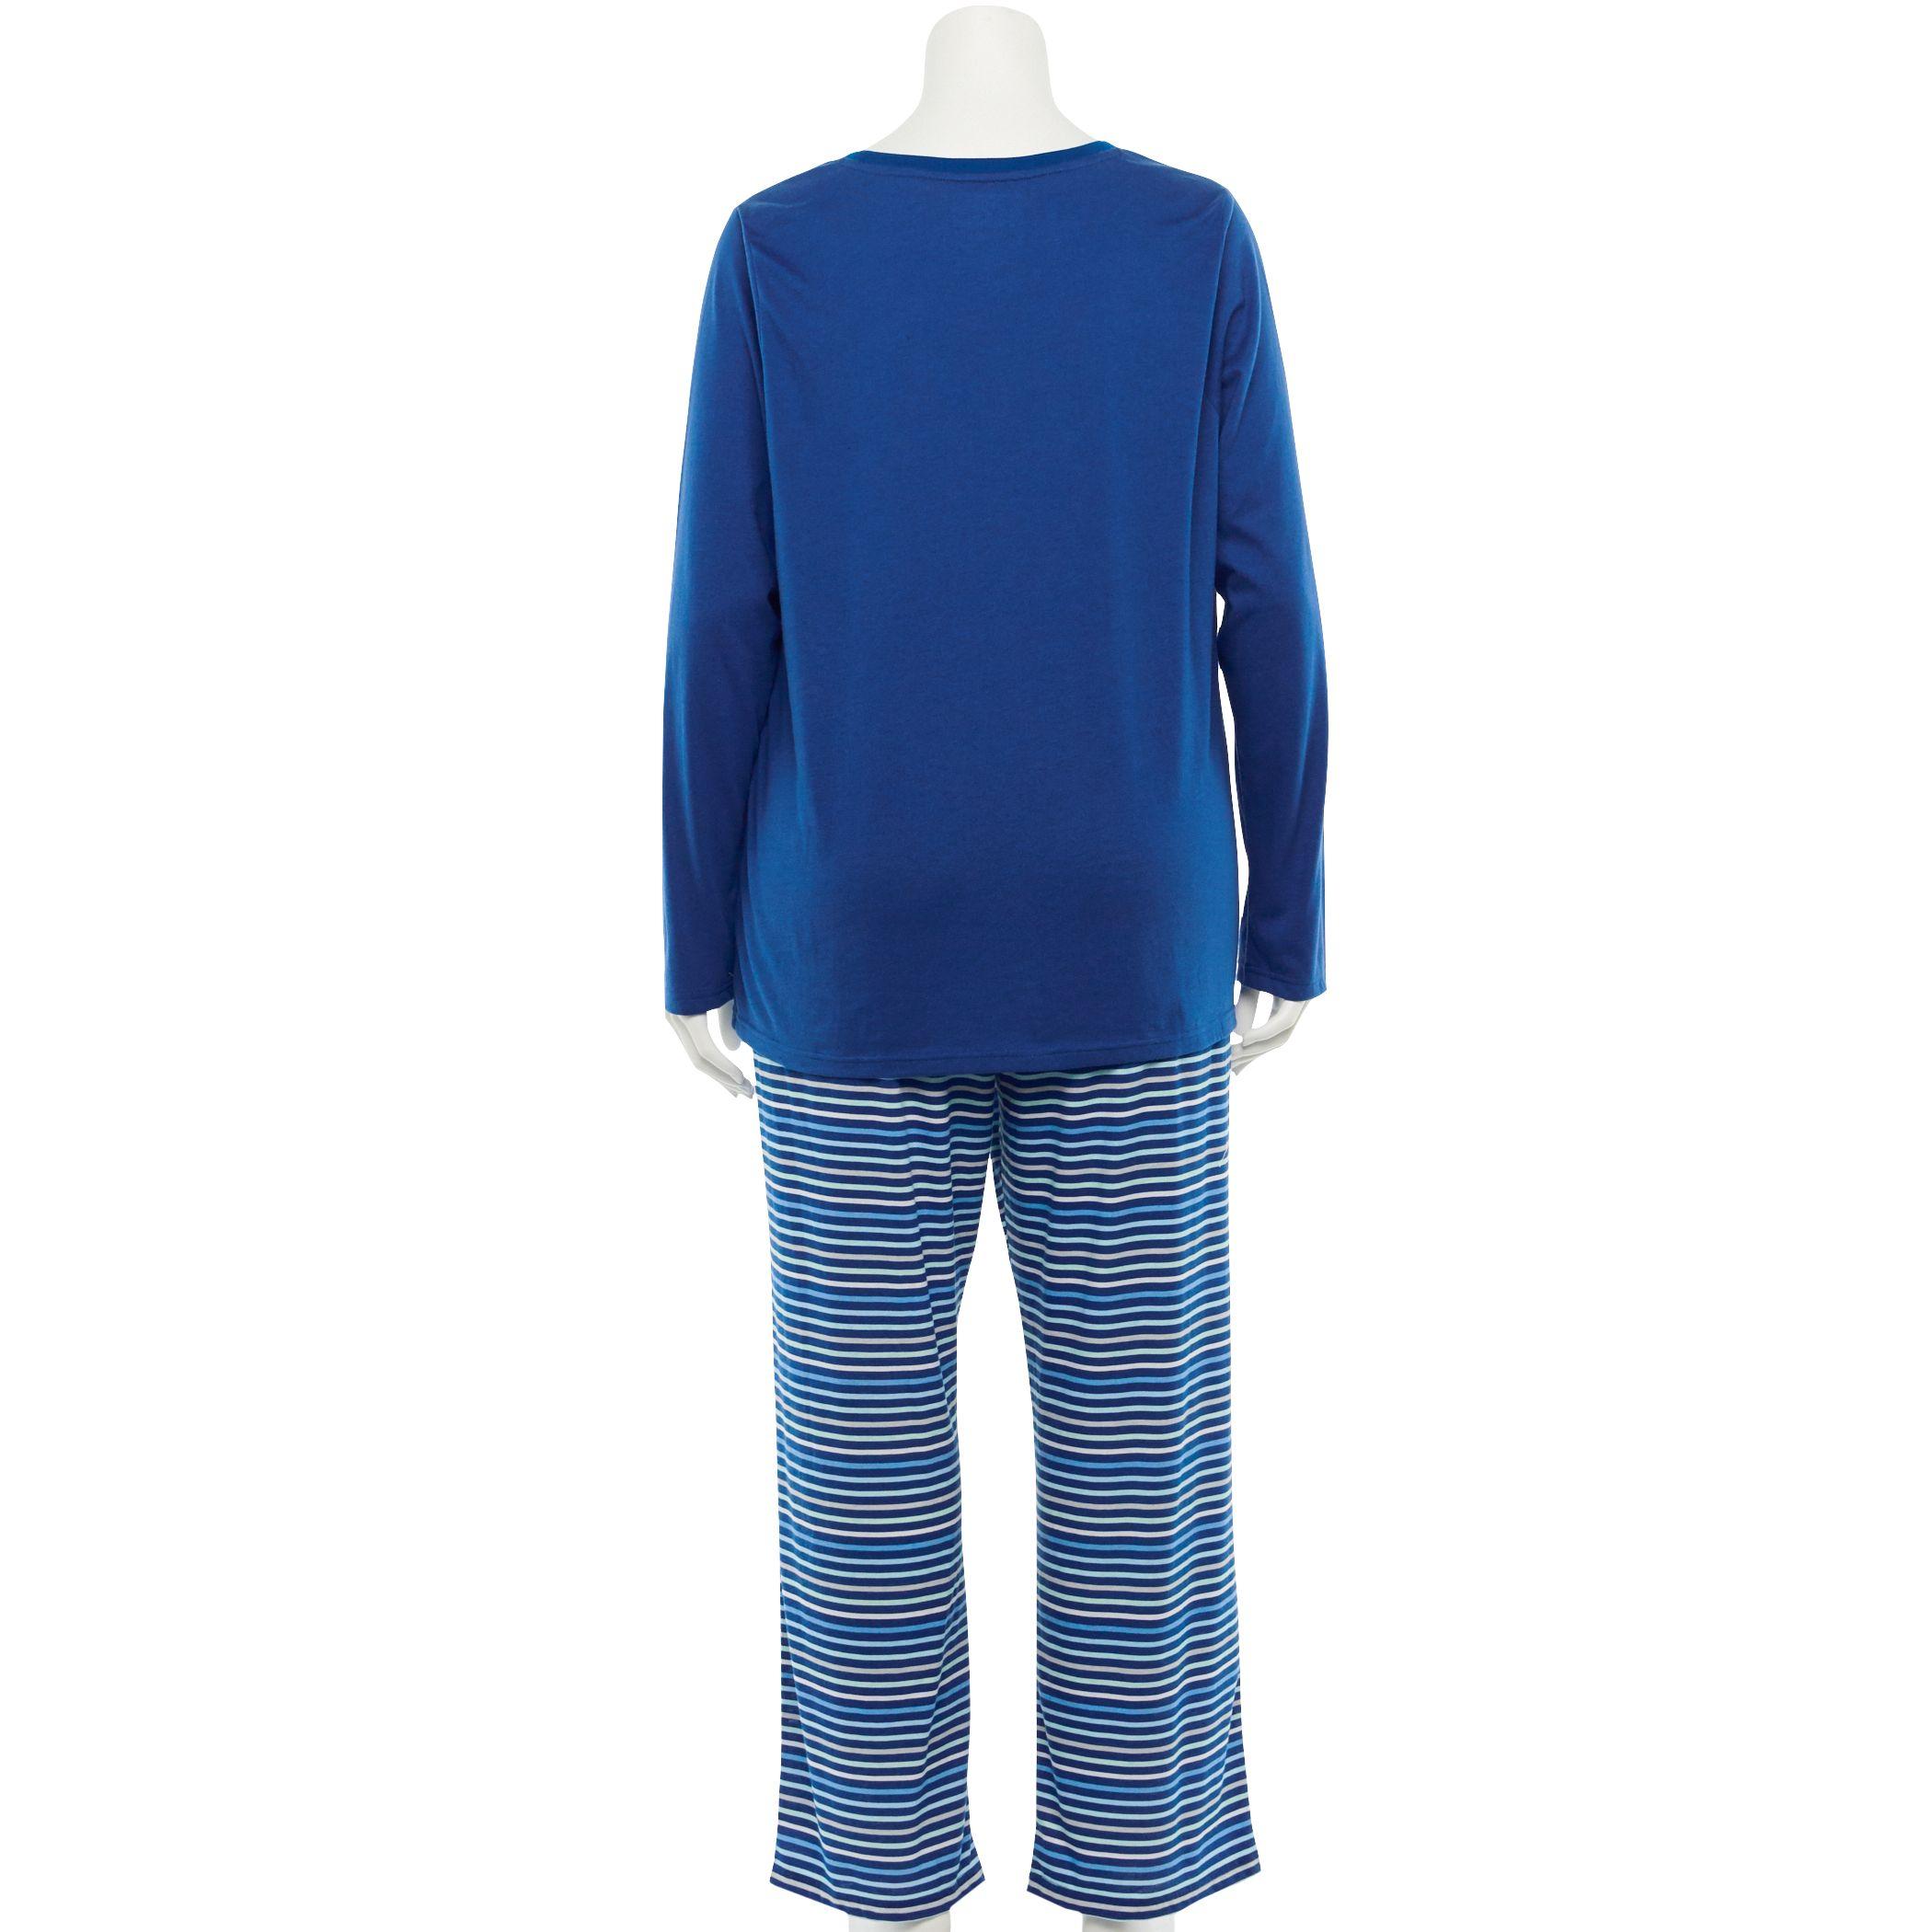 Plus Jammies For Your Families® Hanukkah Graphic Top & Pants Pajama Set